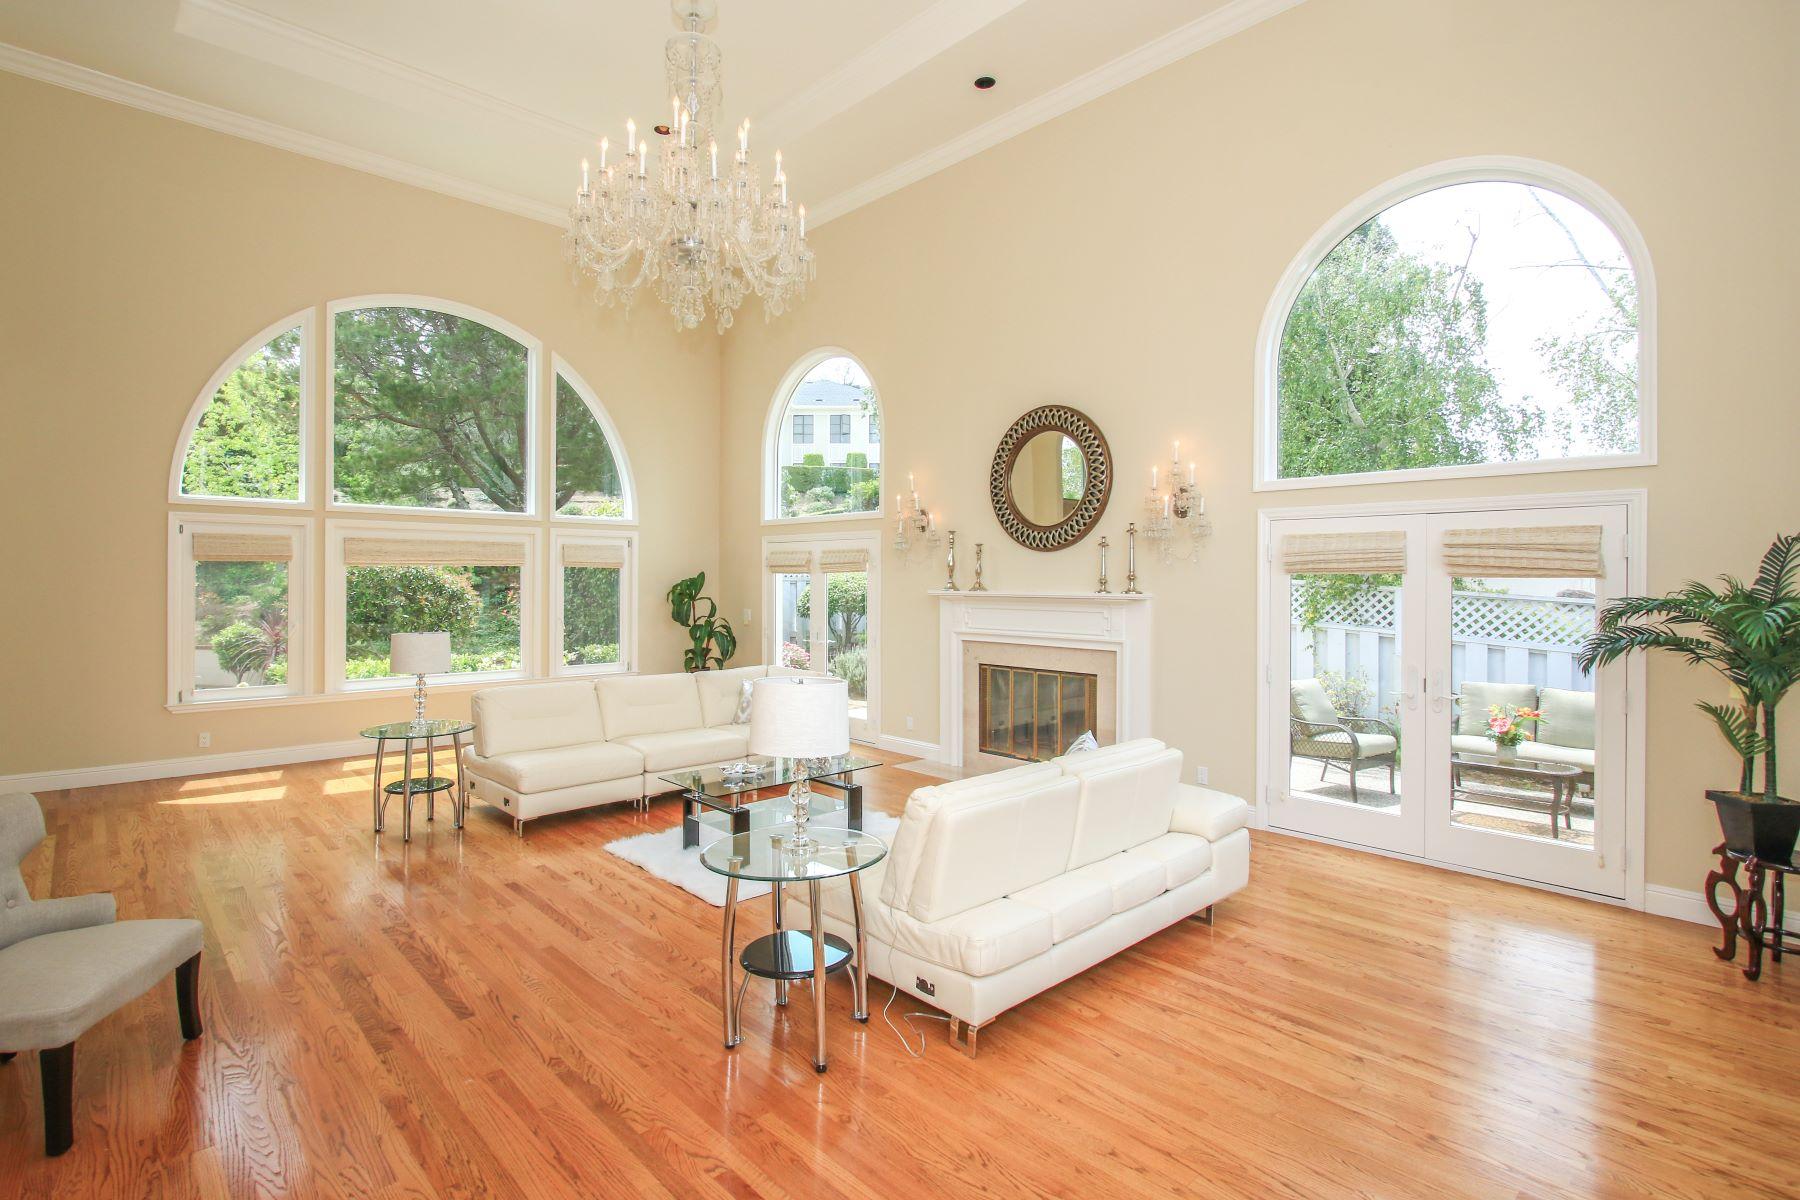 Additional photo for property listing at 75 Eugenia Way, Hillsborough  Hillsborough, California 94010 United States